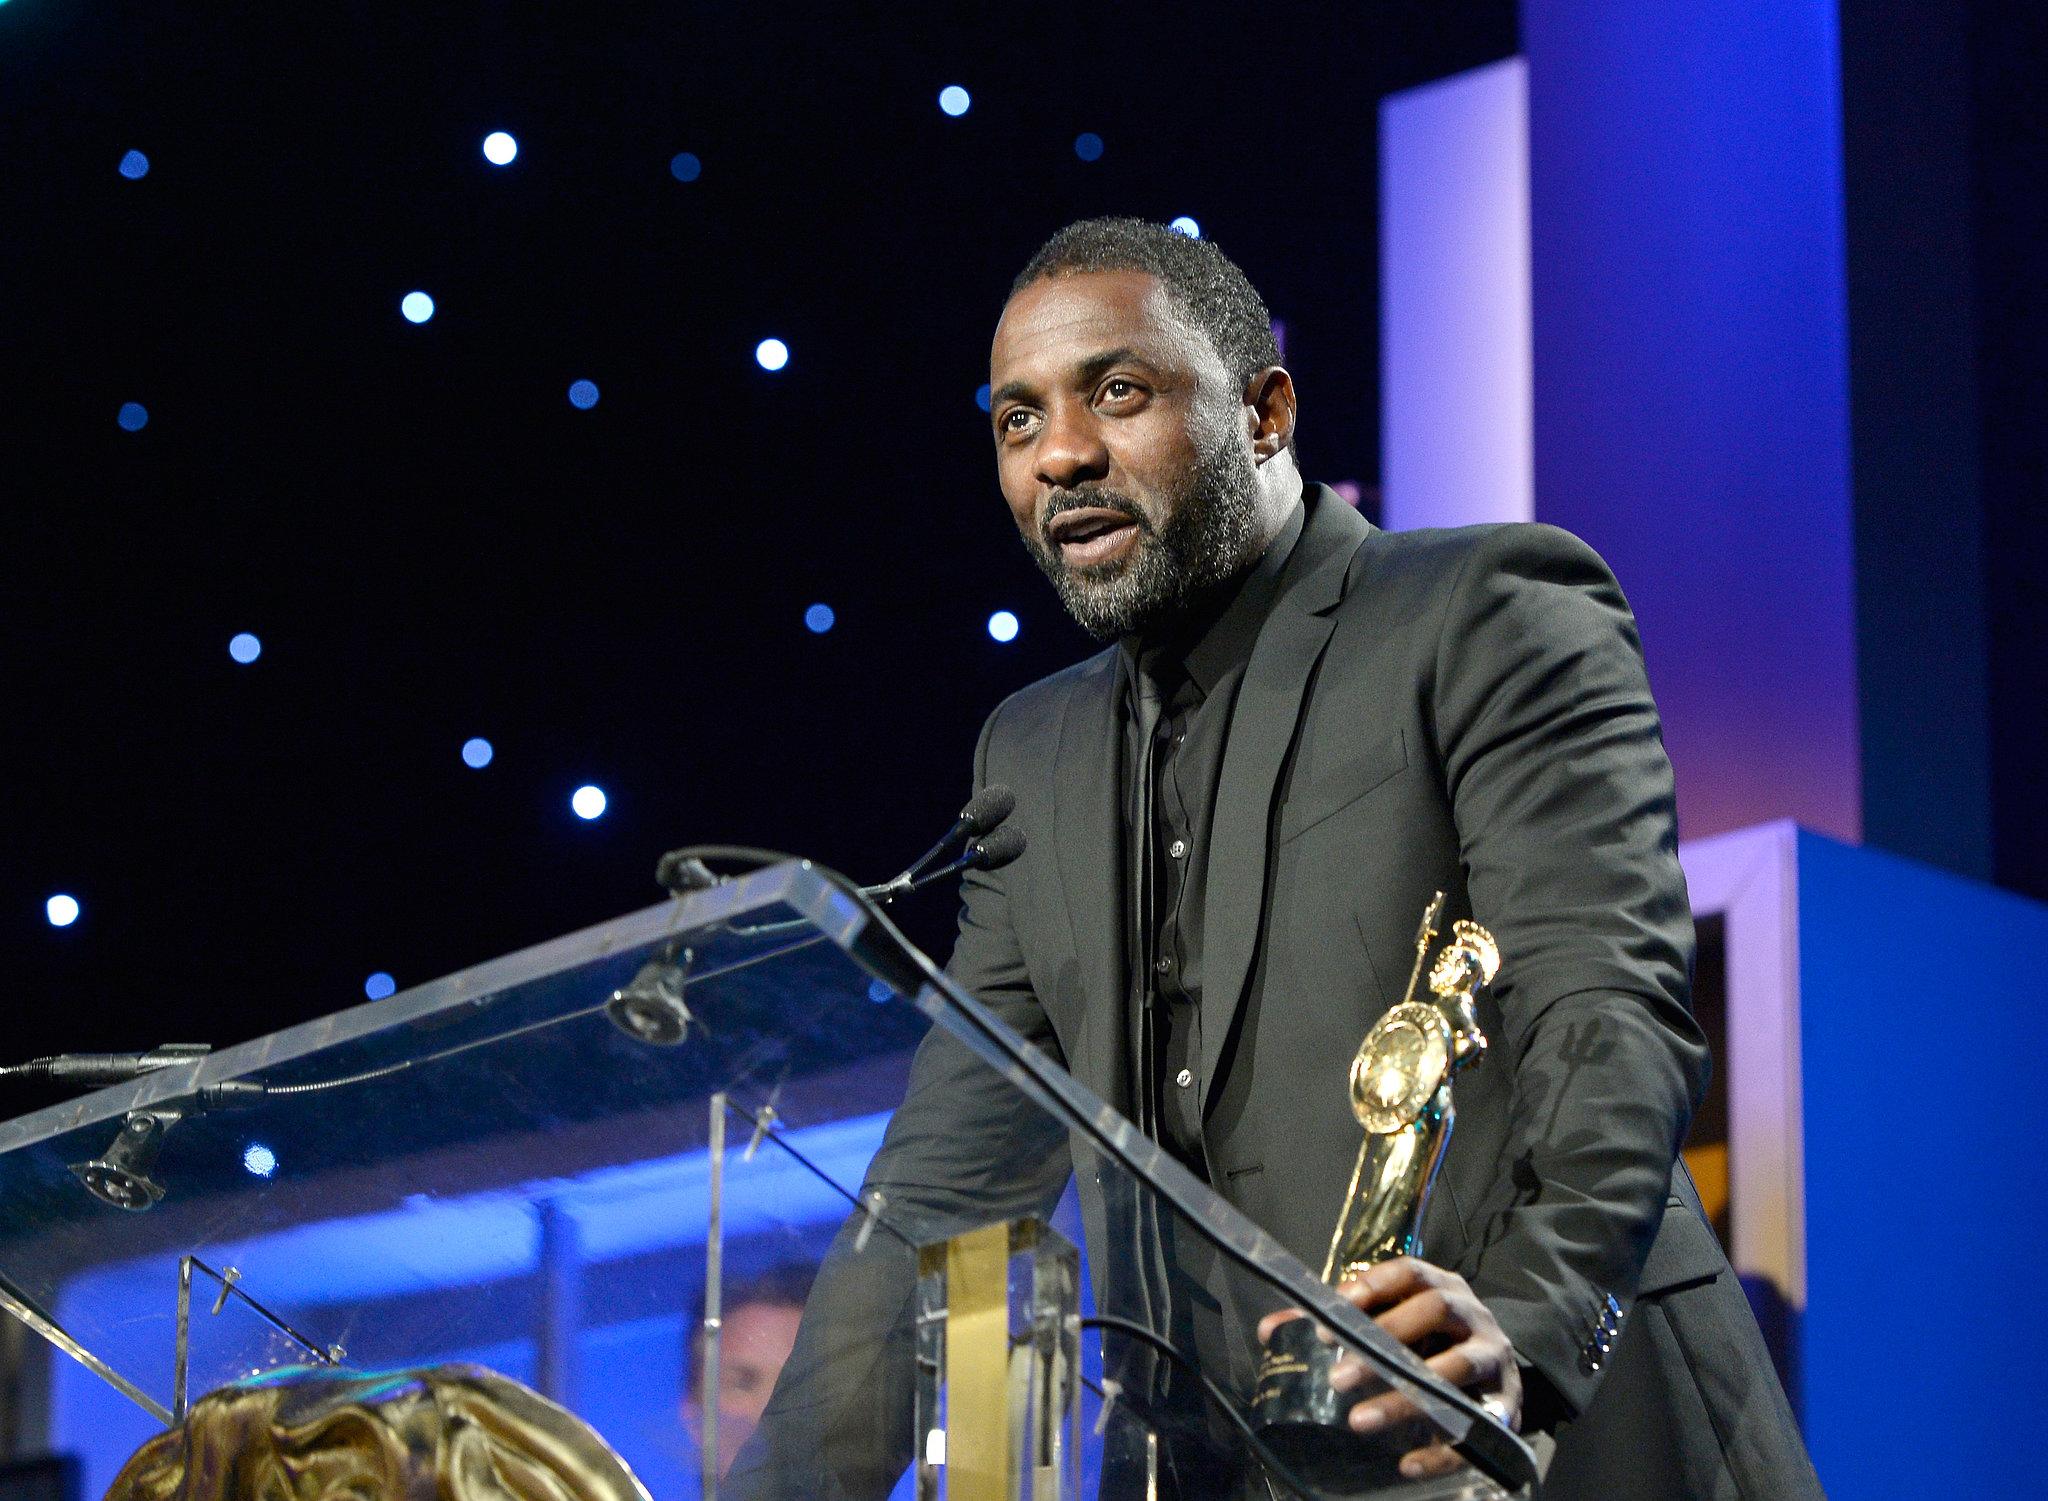 Idris Elba accepted his Britannia humanitarian award during the ceremony.